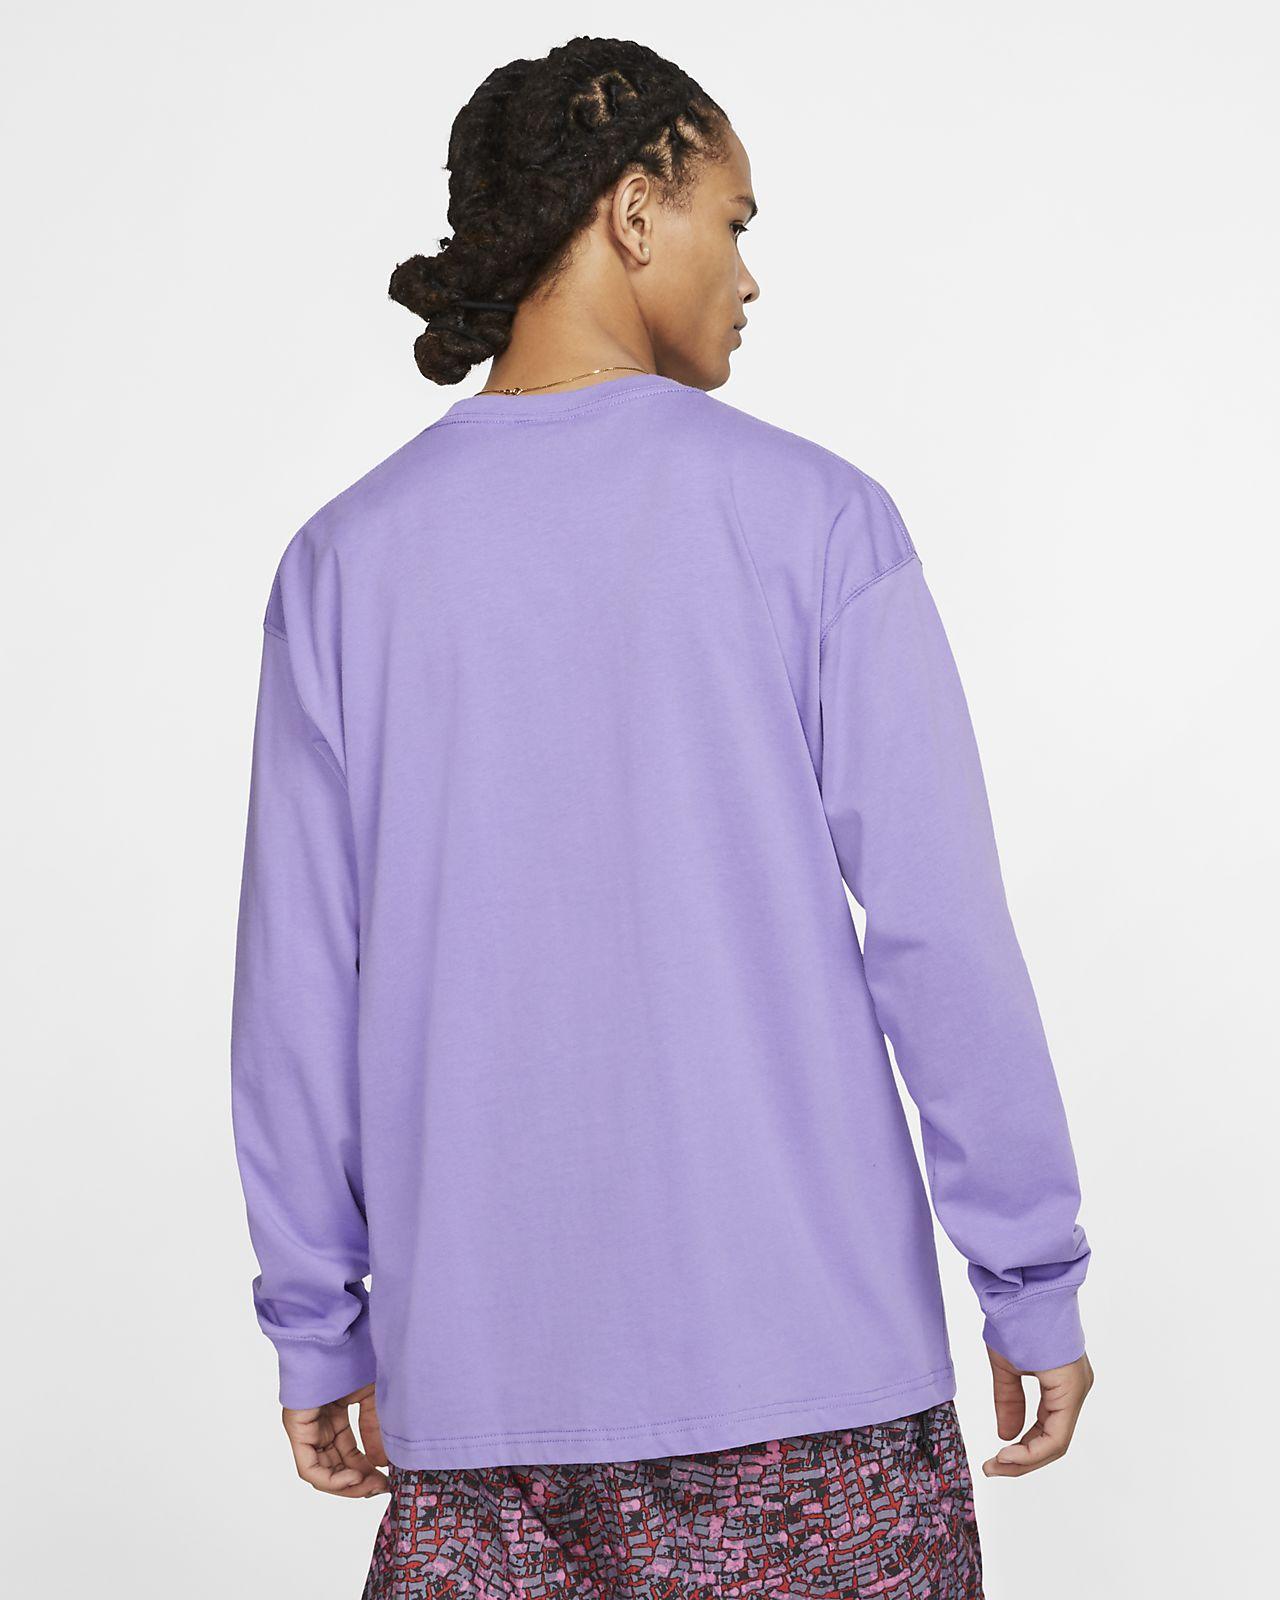 28dcfff4 Nike ACG Long-Sleeve T-Shirt. Nike.com SA